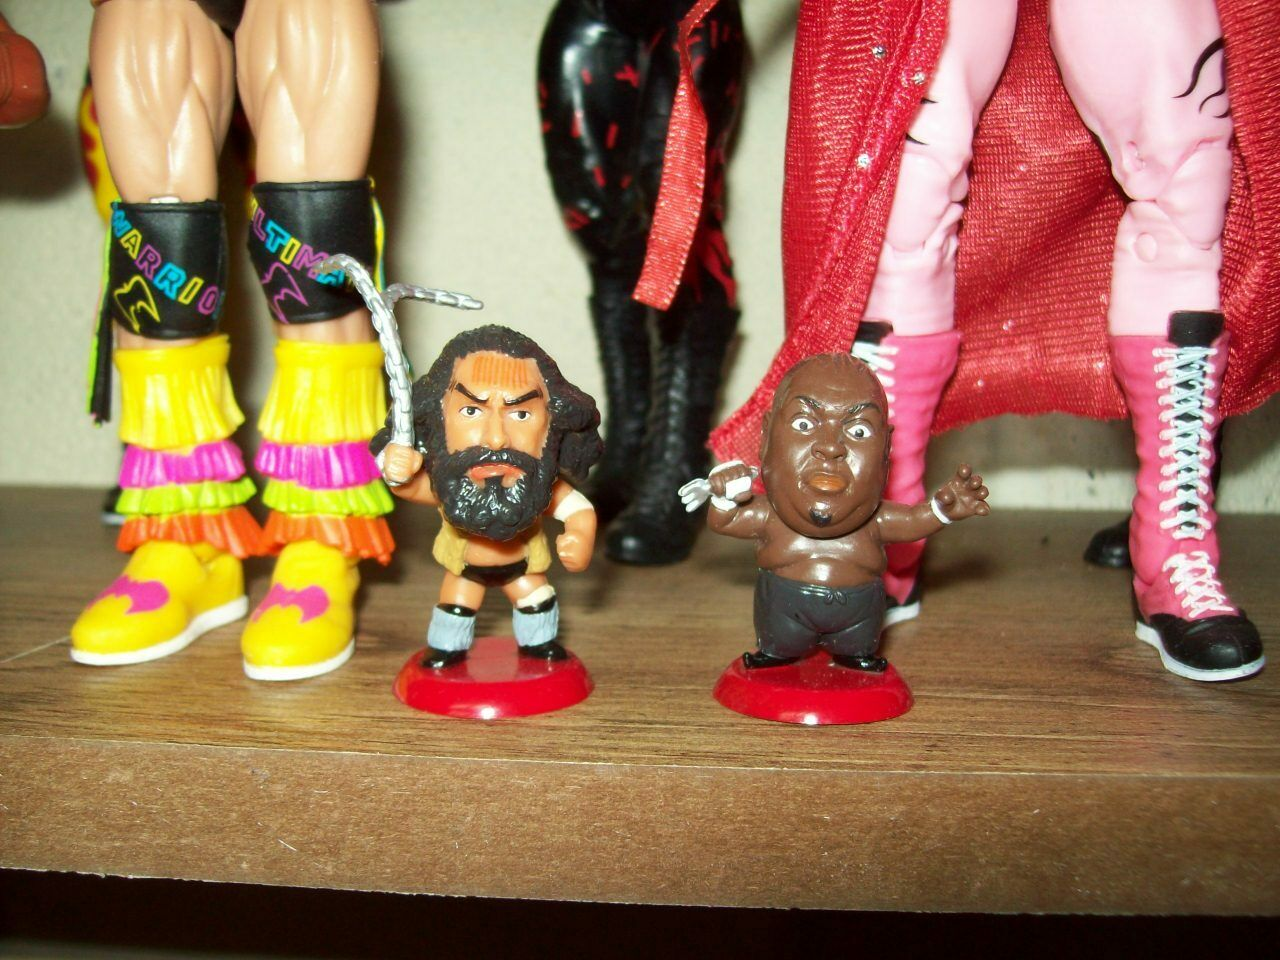 Bruiser Brody & Abdullah The Butcher Mini BIG HEADS Japon WWE WWF WCW NXT ECW